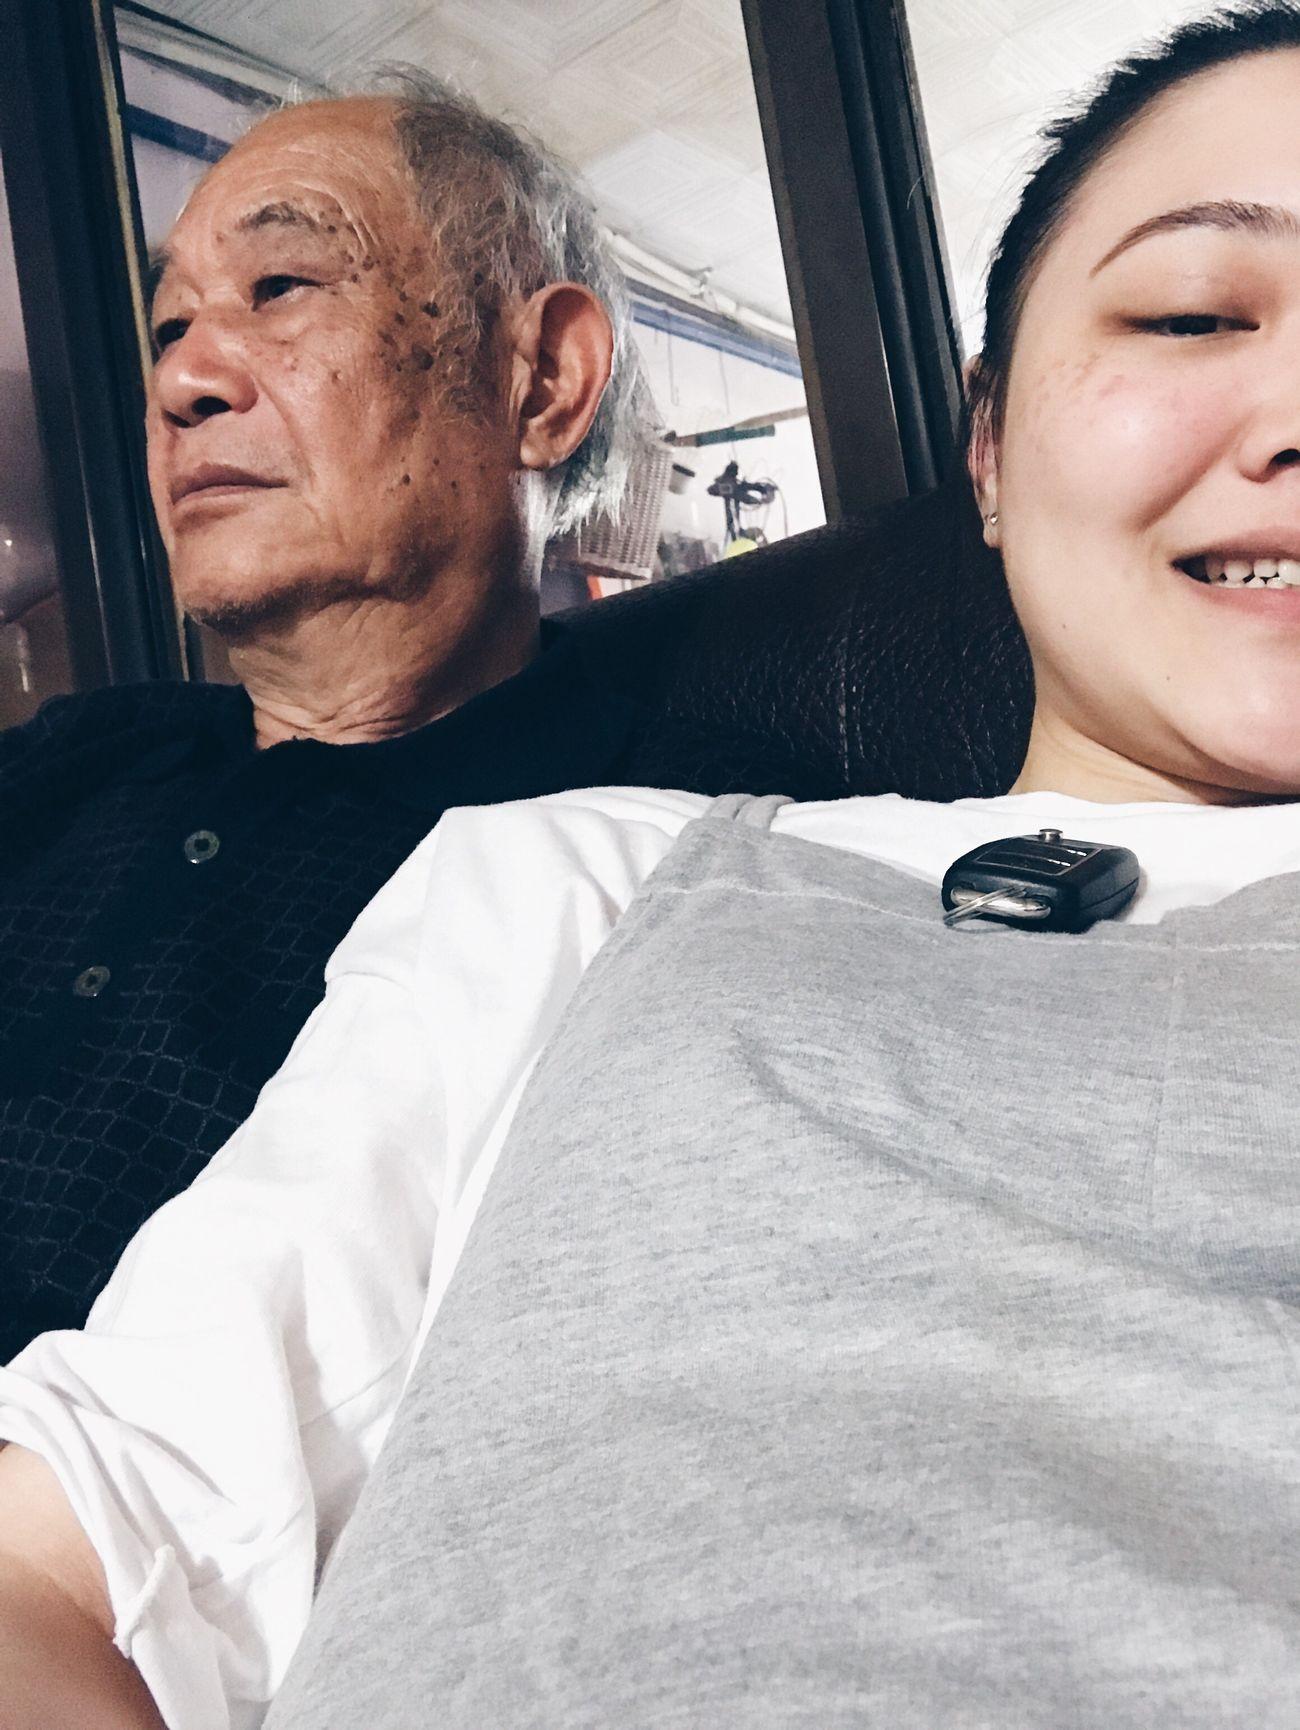 20170406 W my lovely grandpa Hello World VSCO Taiwan Photography Yolo EyeEm Kate's Daily Vscocam Love